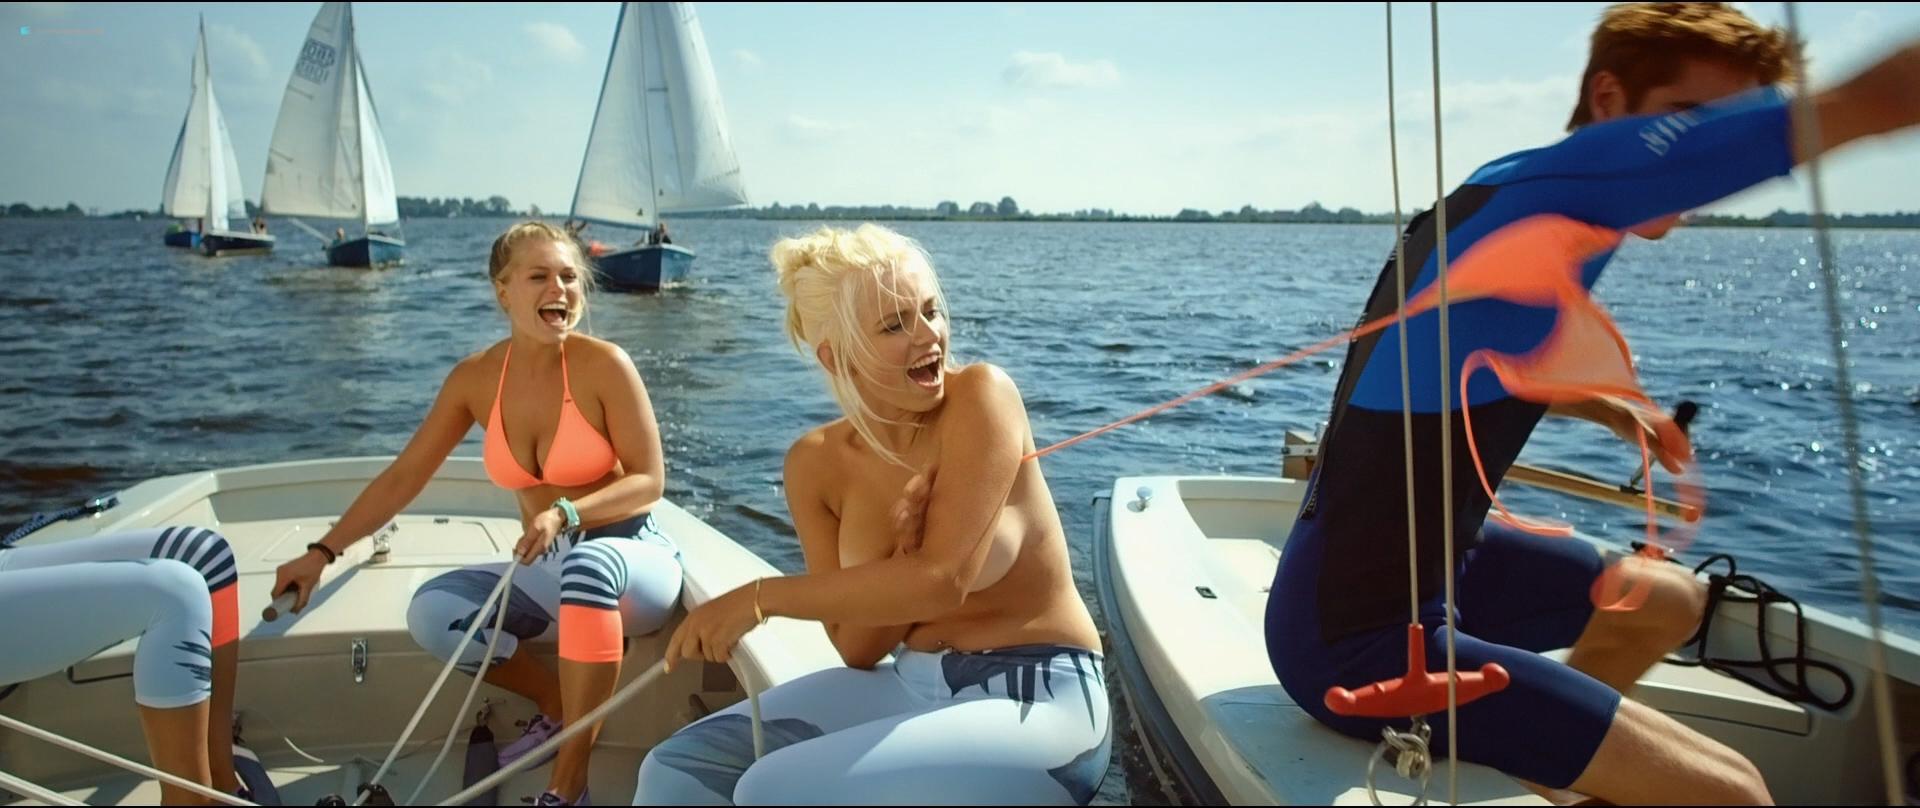 Holly Mae Brood hot and sexy Carolien Spoor, Marly van der Velden nude sex - Sneekweek (NL-2016) HD 1080p BluRay (2)